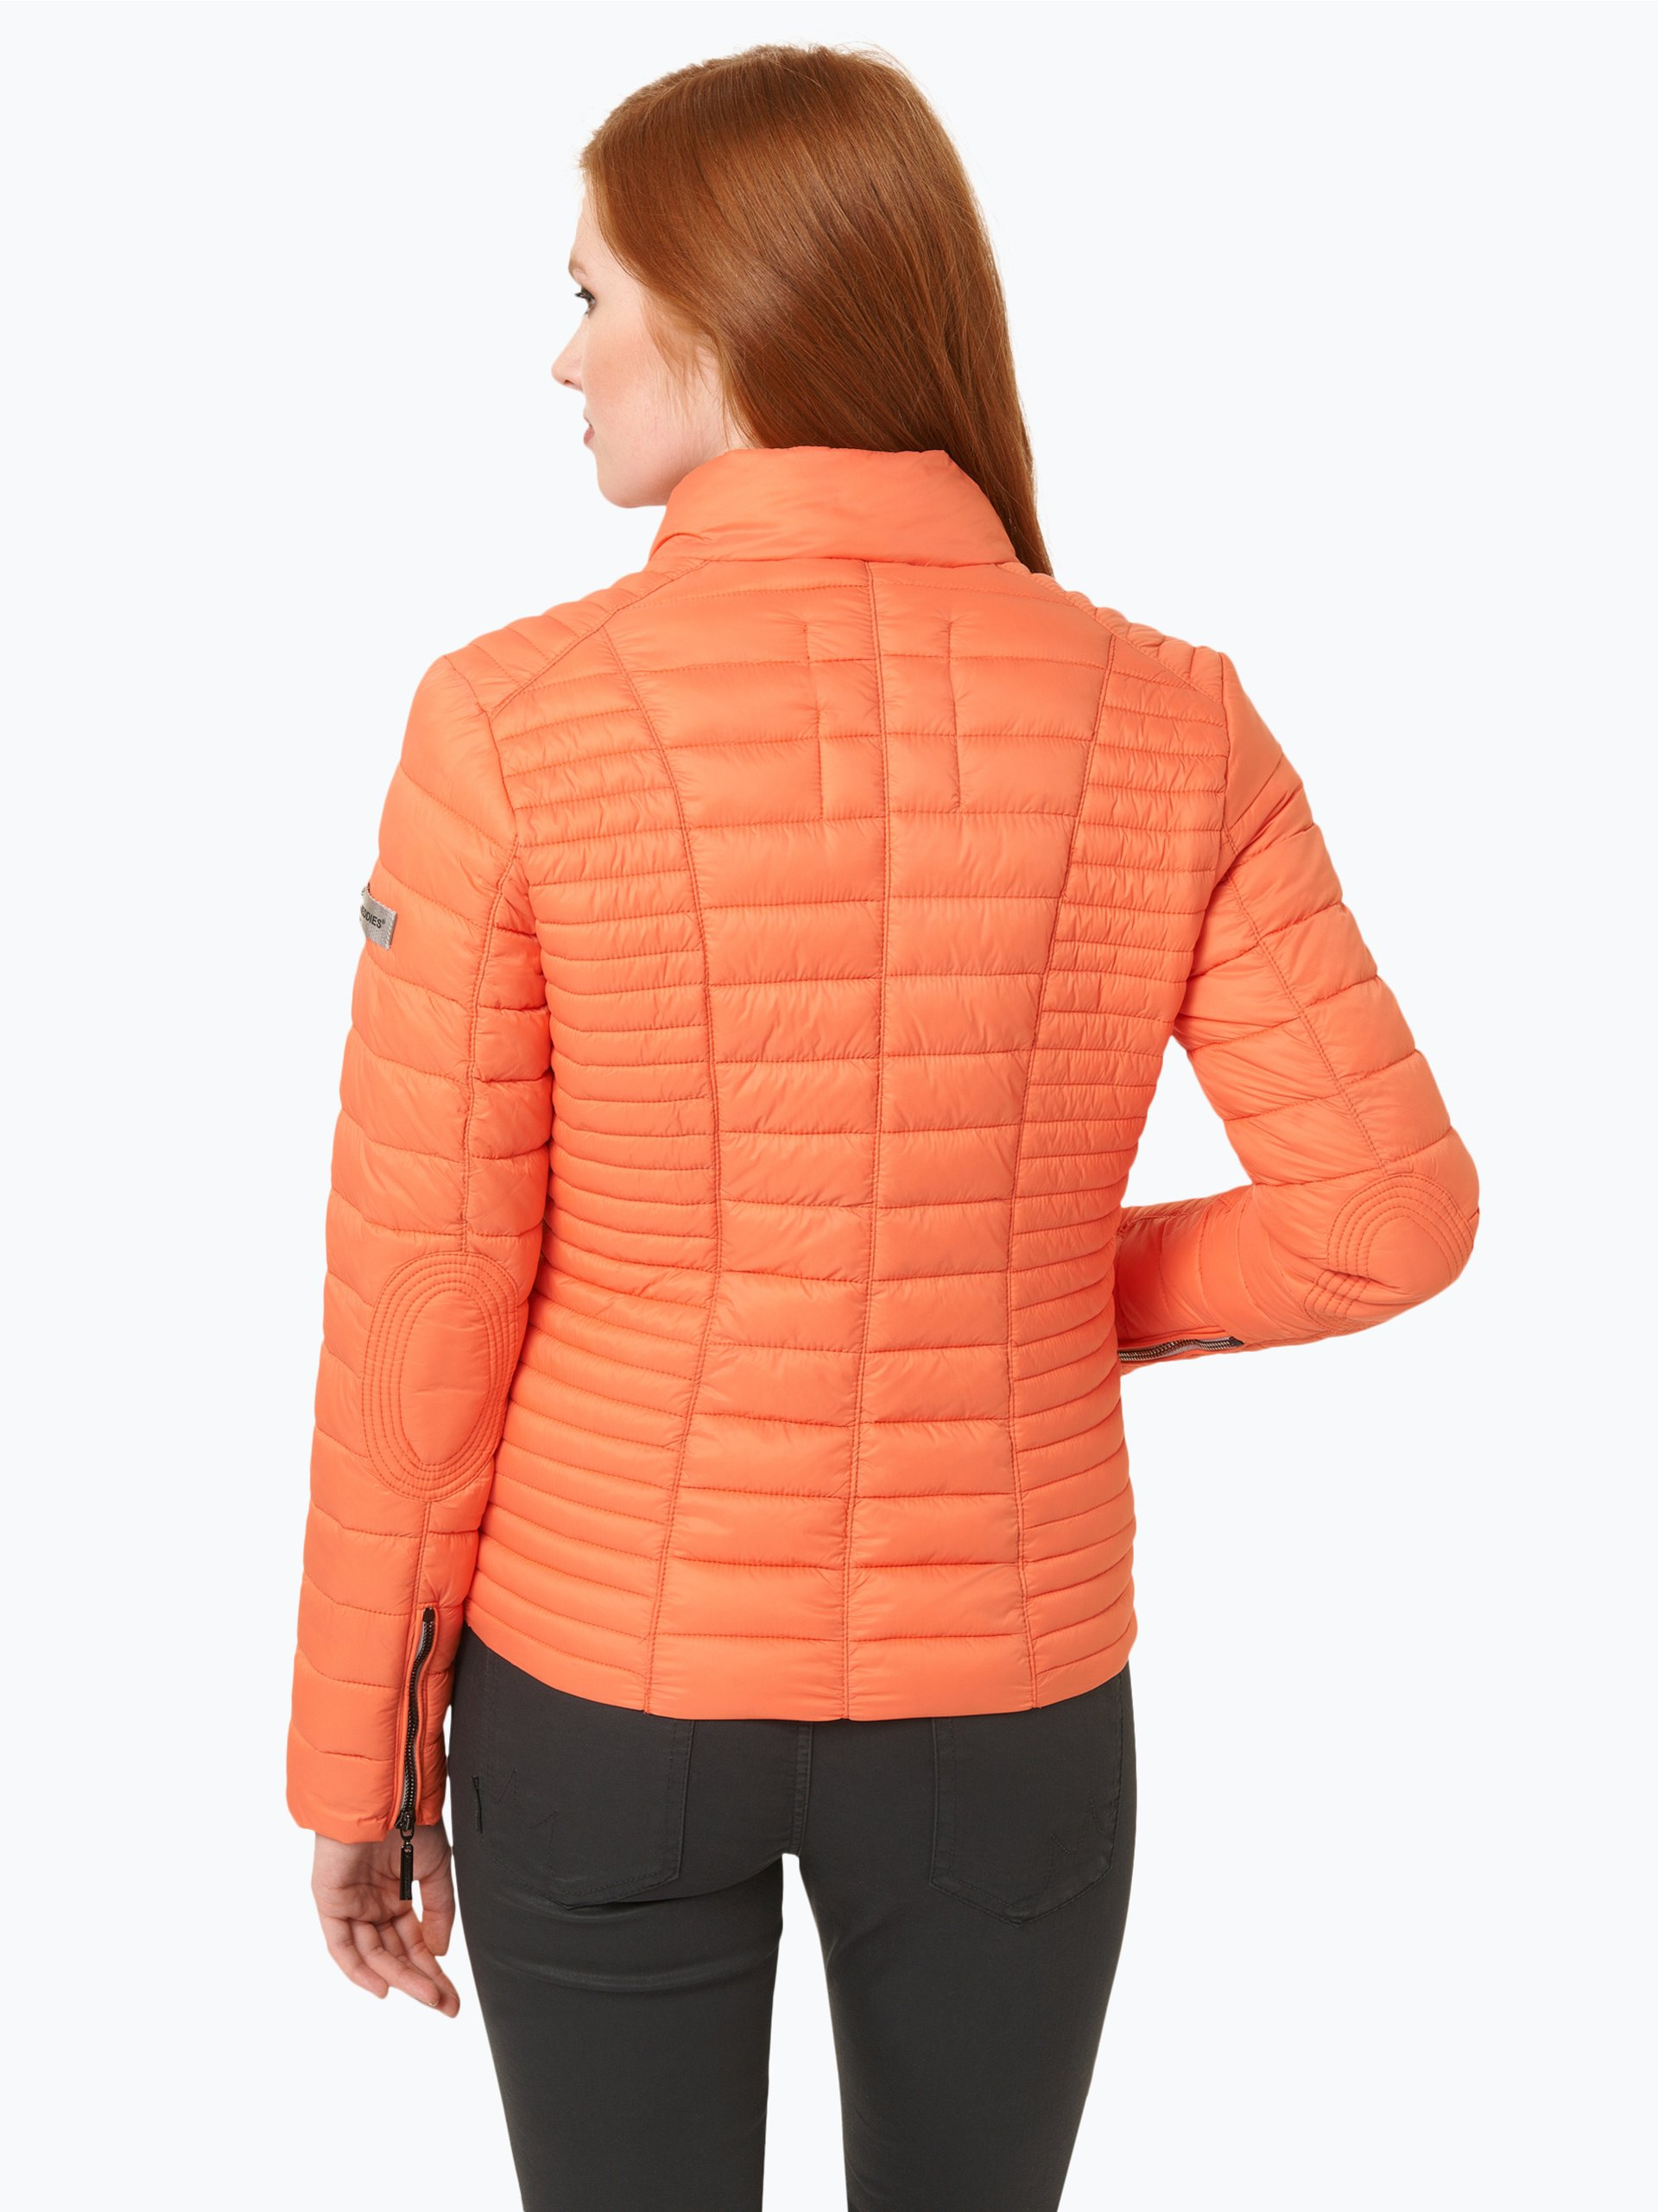 frieda freddies damen funktionsjacke orange uni online. Black Bedroom Furniture Sets. Home Design Ideas